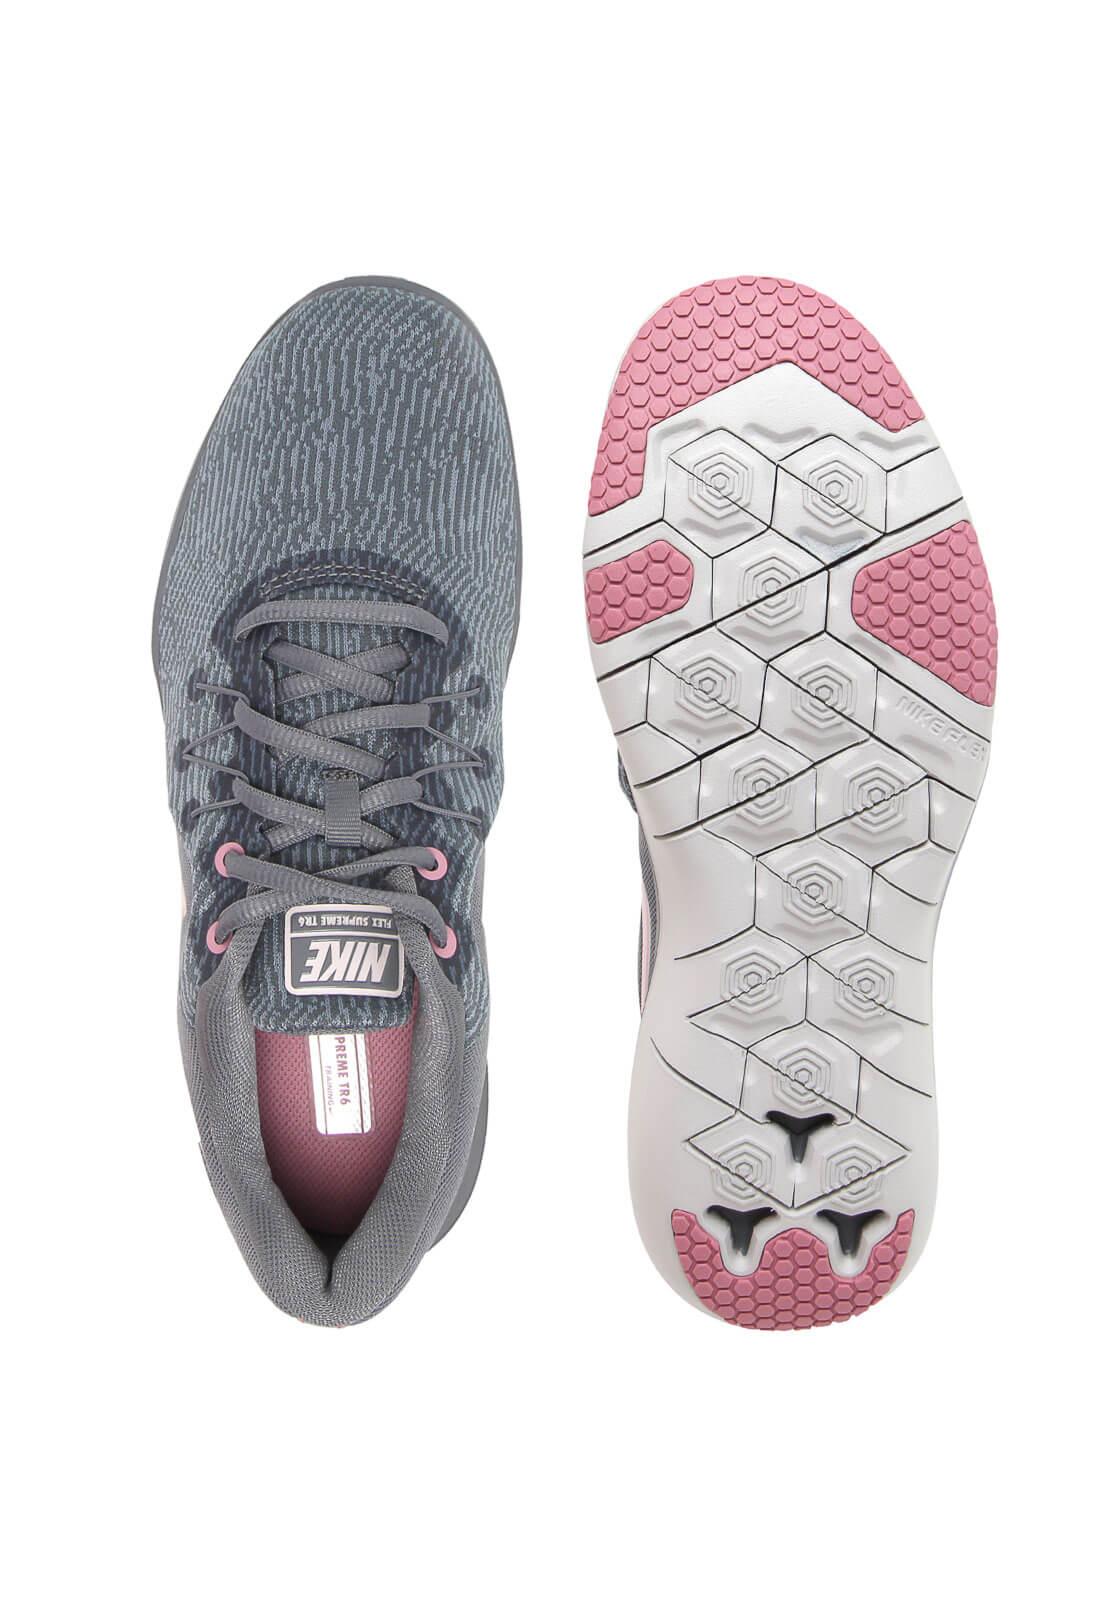 b9b9416c6769b Tênis Feminino Nike Flex Supreme Tr 6 - BRACIA SHOP  Loja de Roupas ...